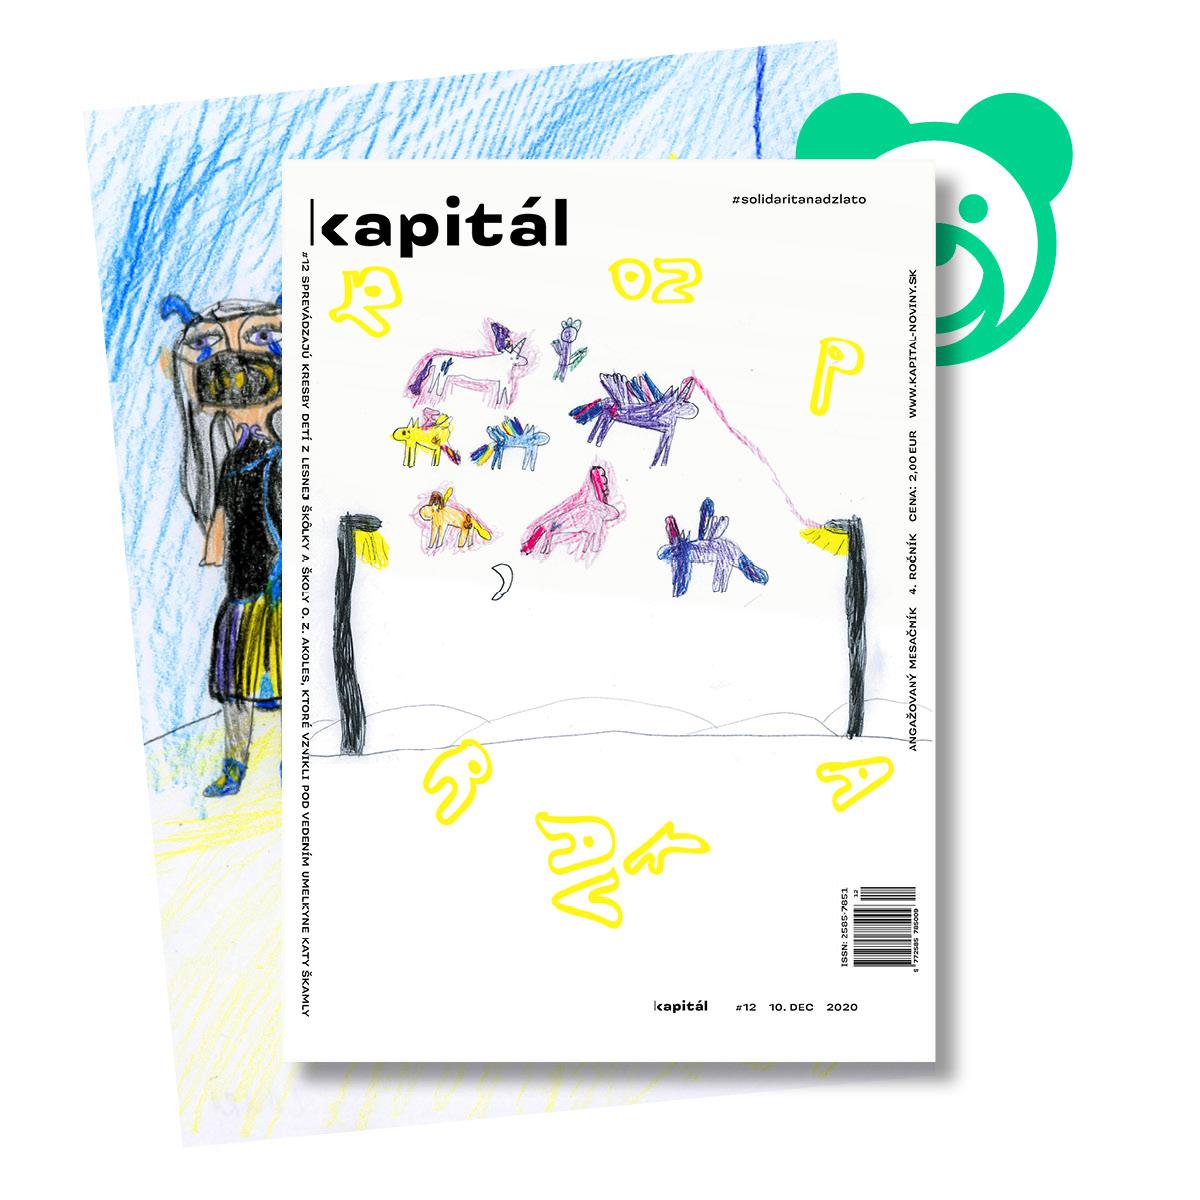 https://kapital-noviny.sk/wp-content/uploads/2020/12/web_obalka2.jpg